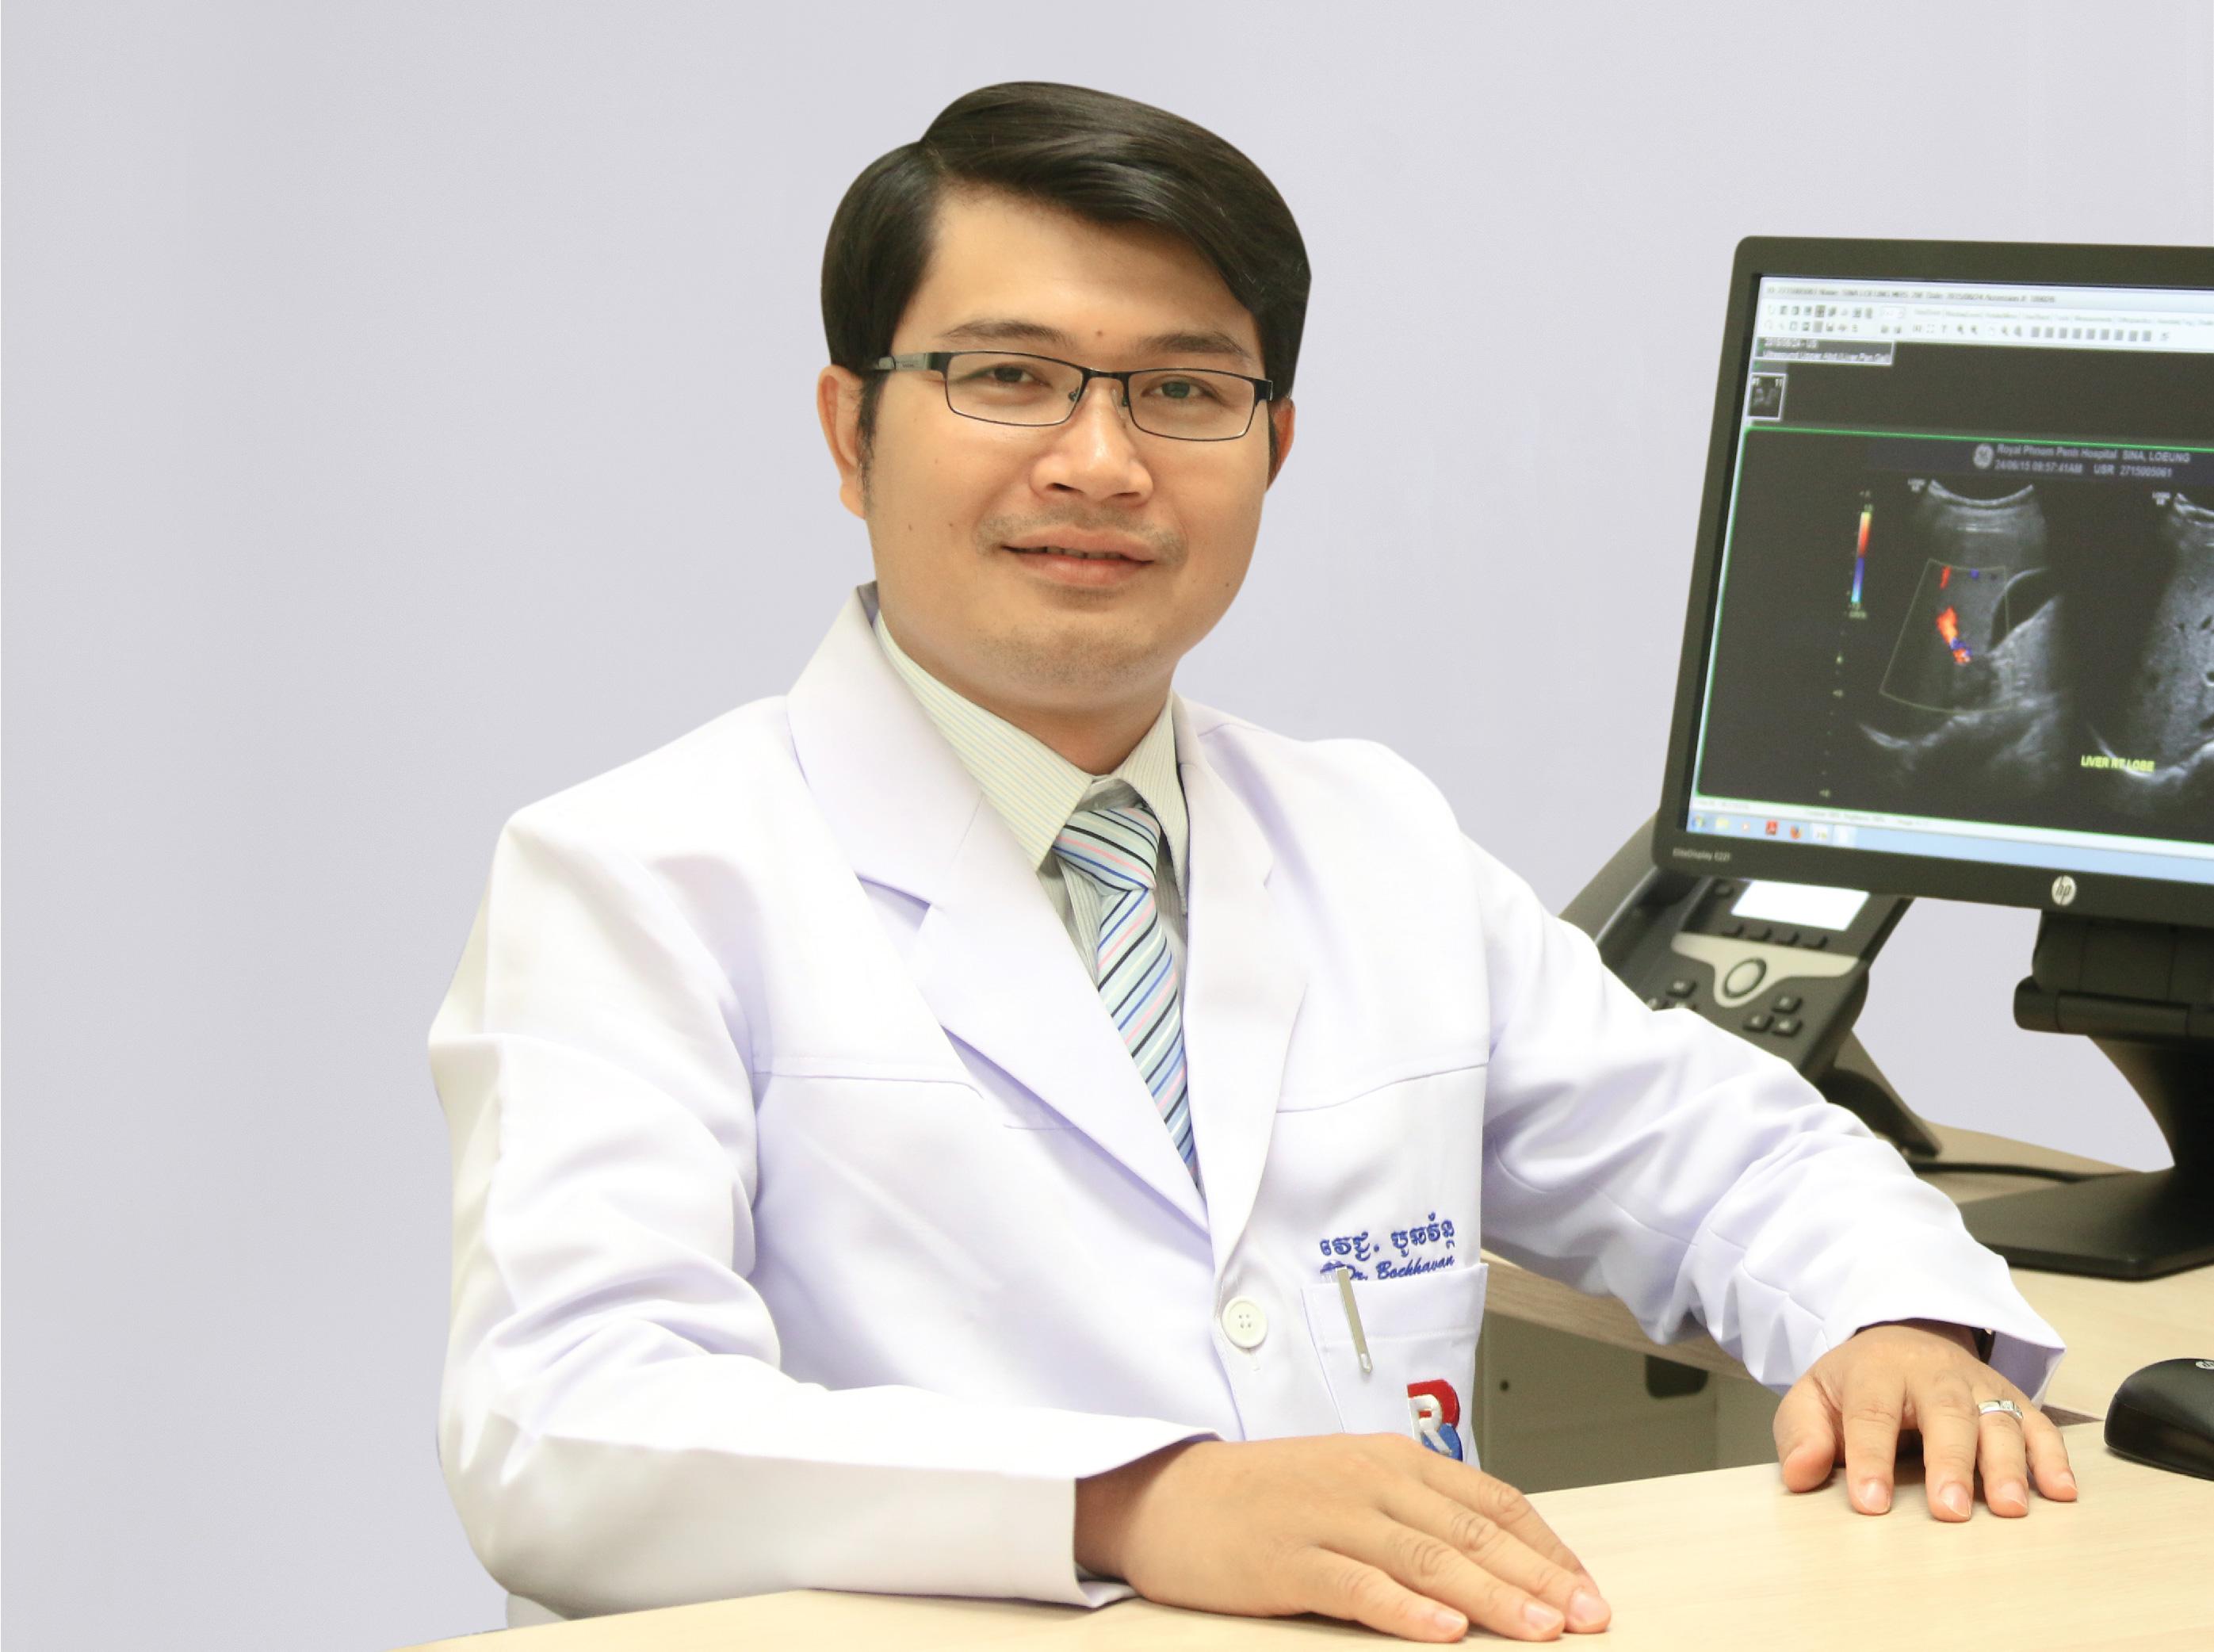 Dr. Sin Bochhavann